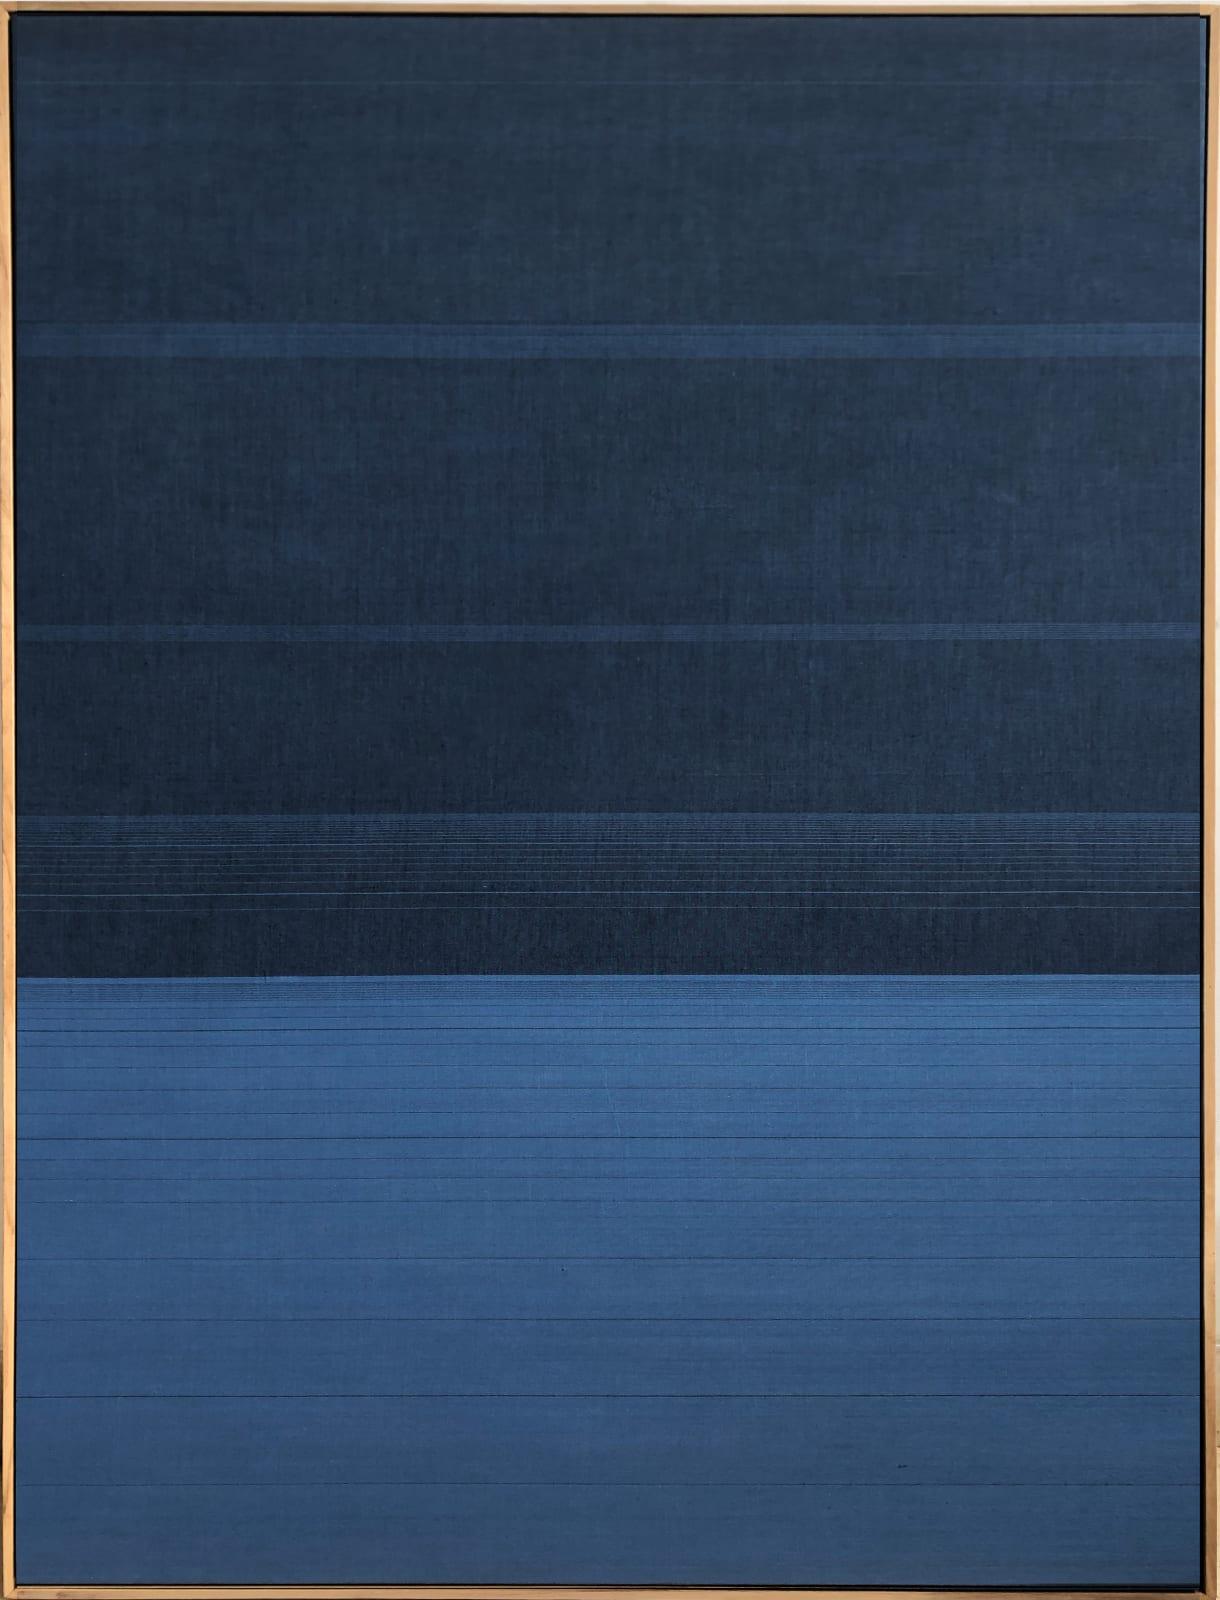 Alexander Sebastianus, M'biru #01, 2020